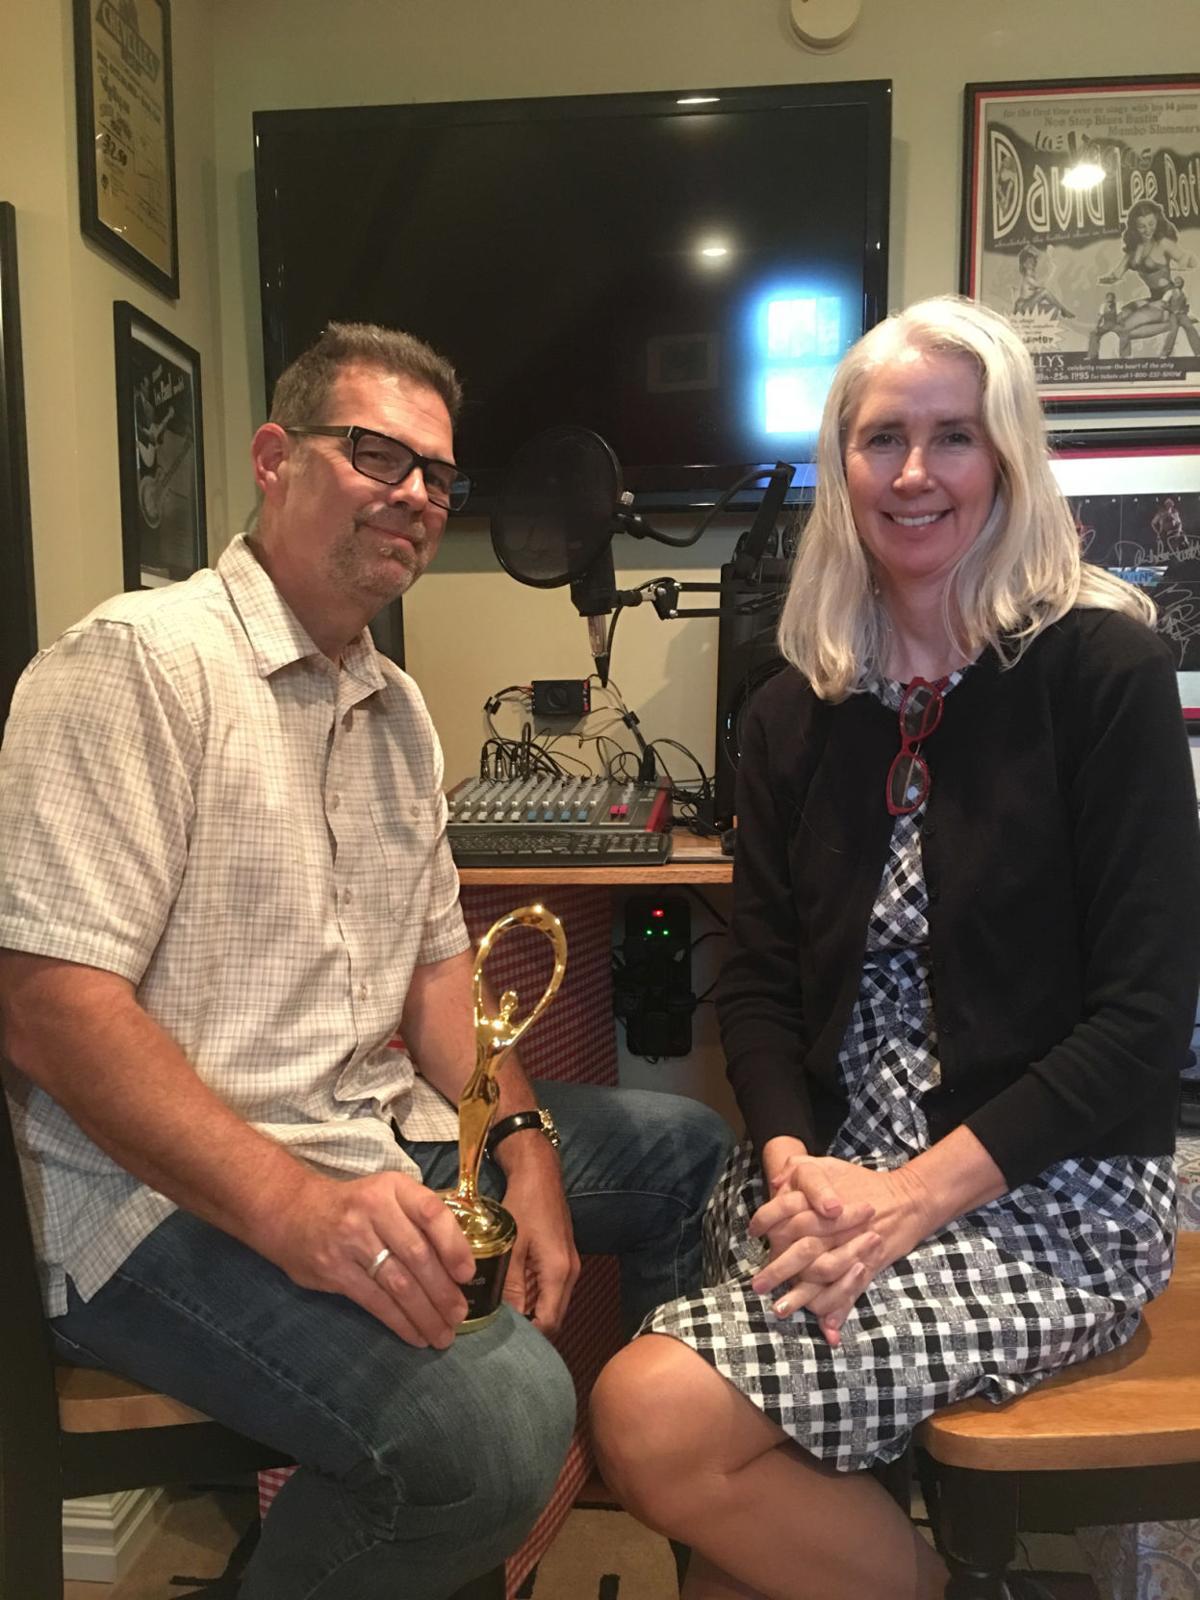 Joe Burns and Tammy Burns